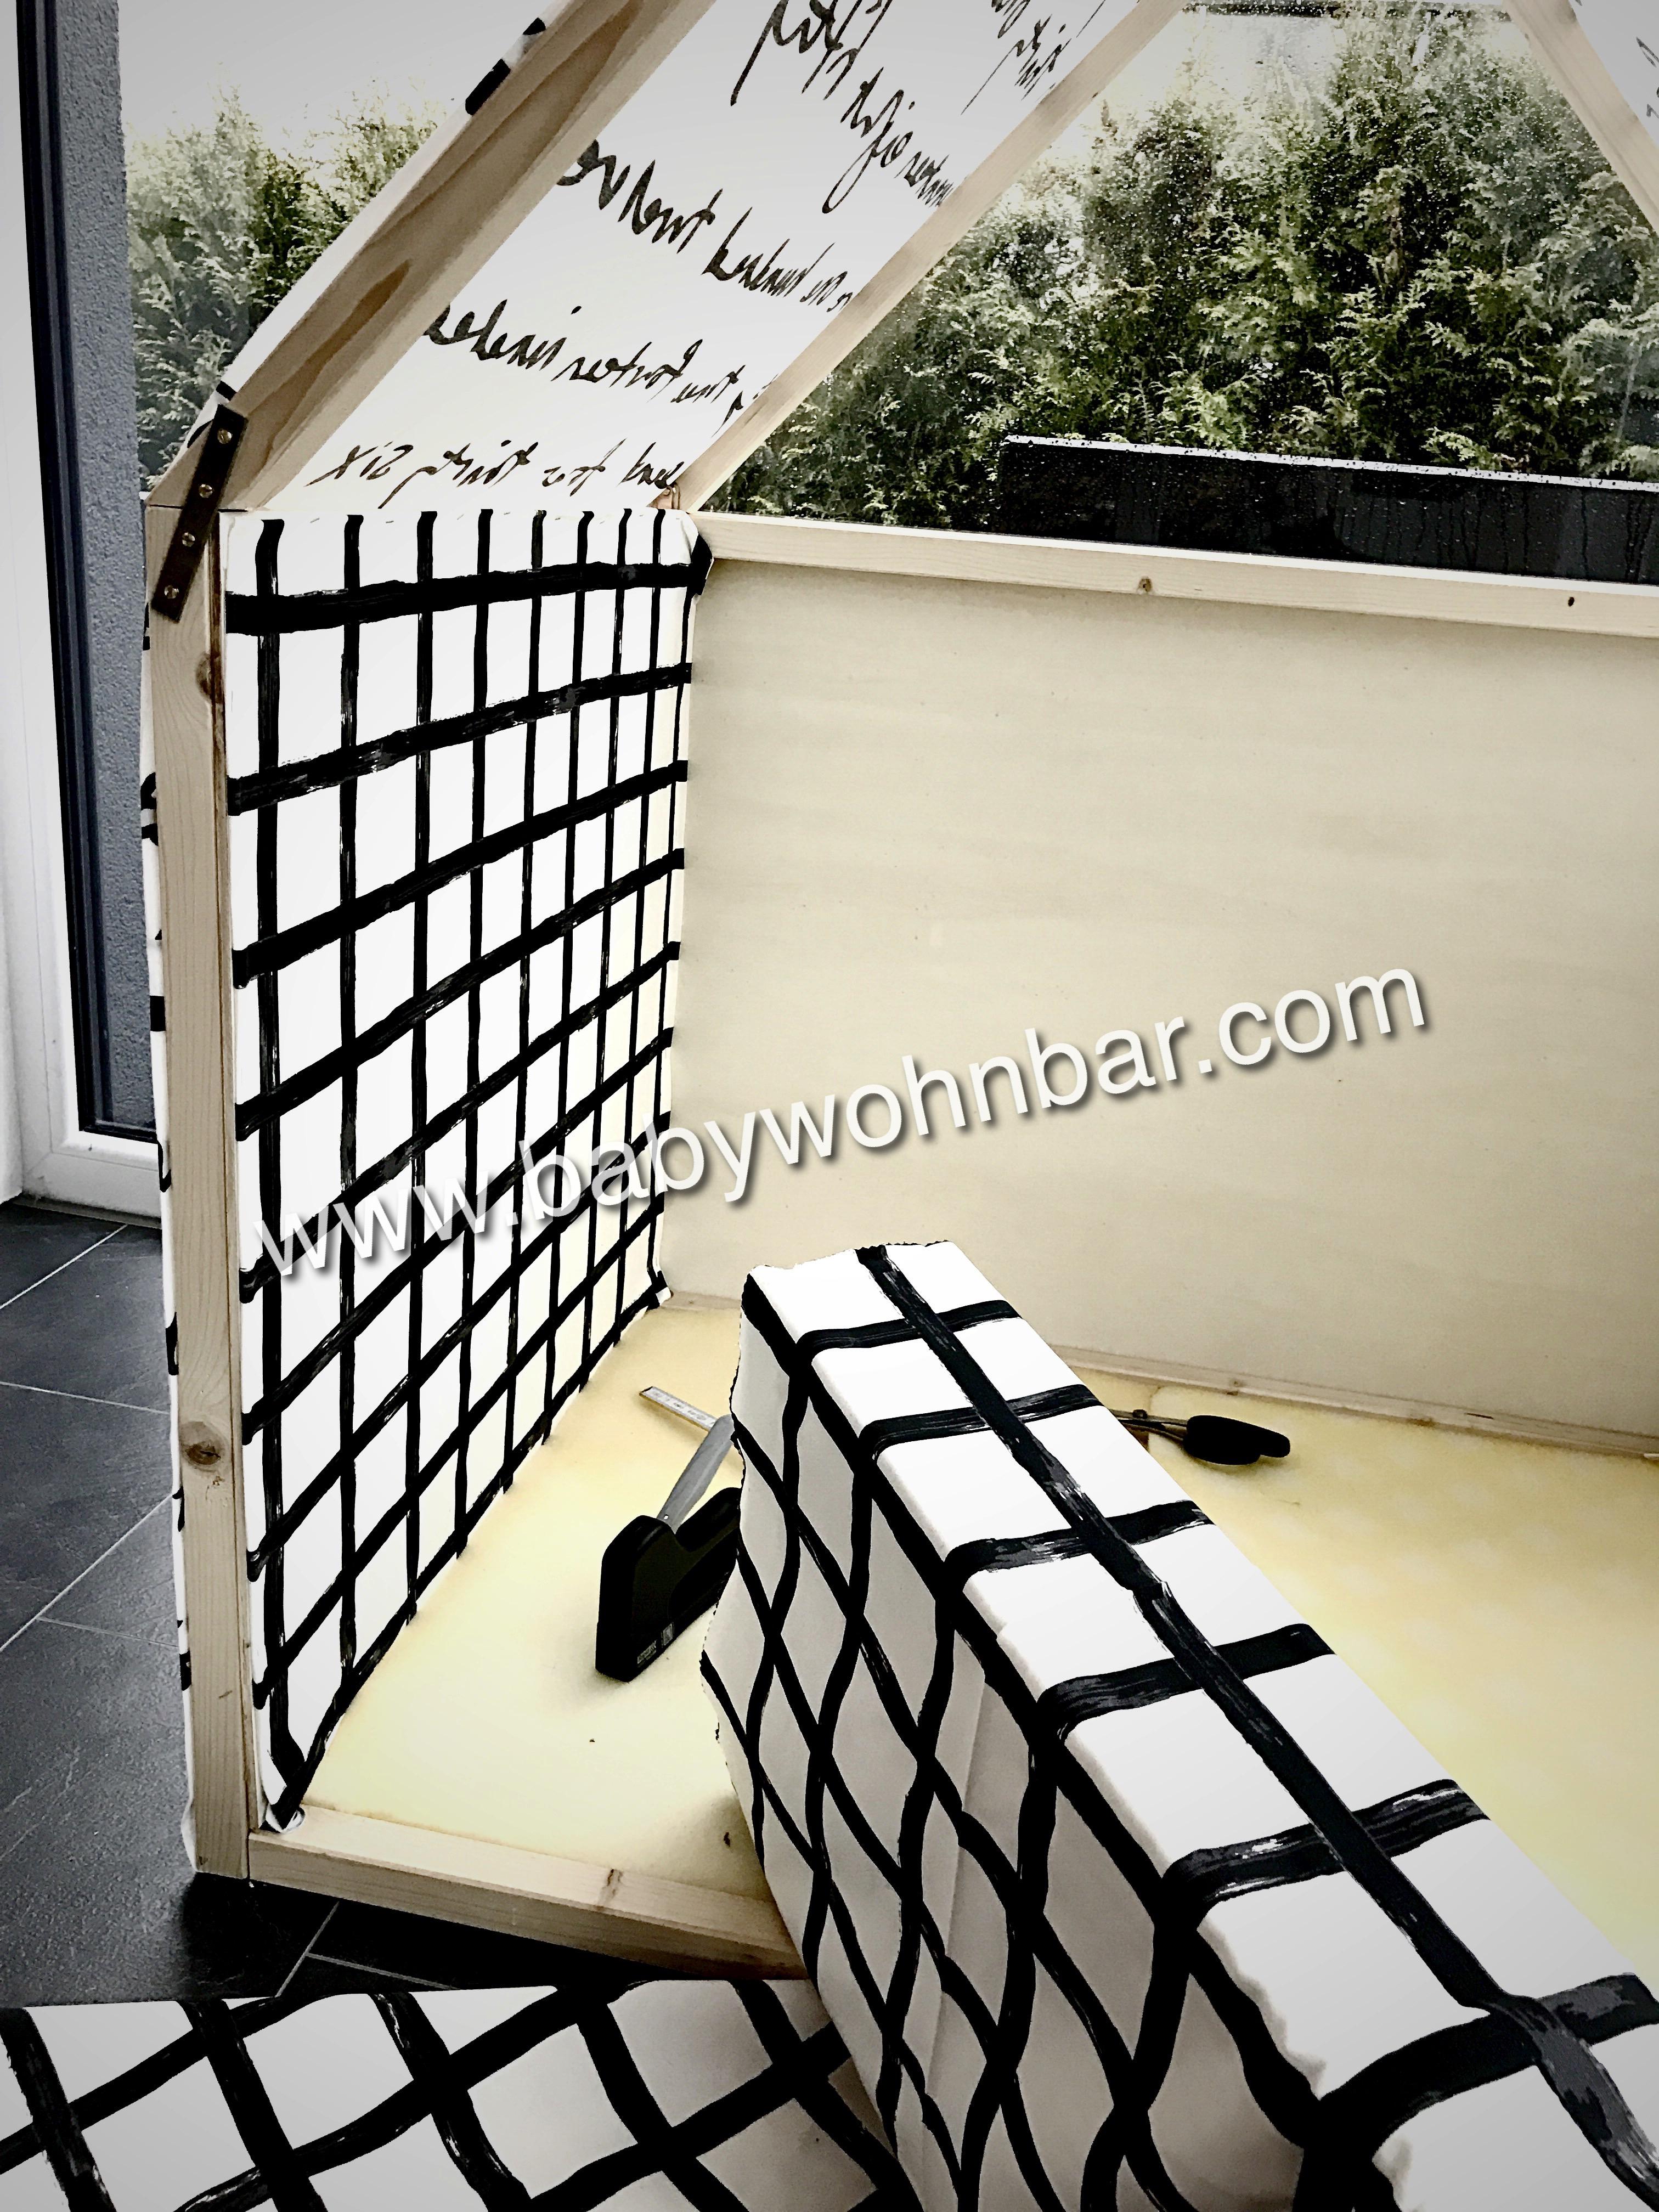 diy gro es b llebad aus holz babywohnbar. Black Bedroom Furniture Sets. Home Design Ideas